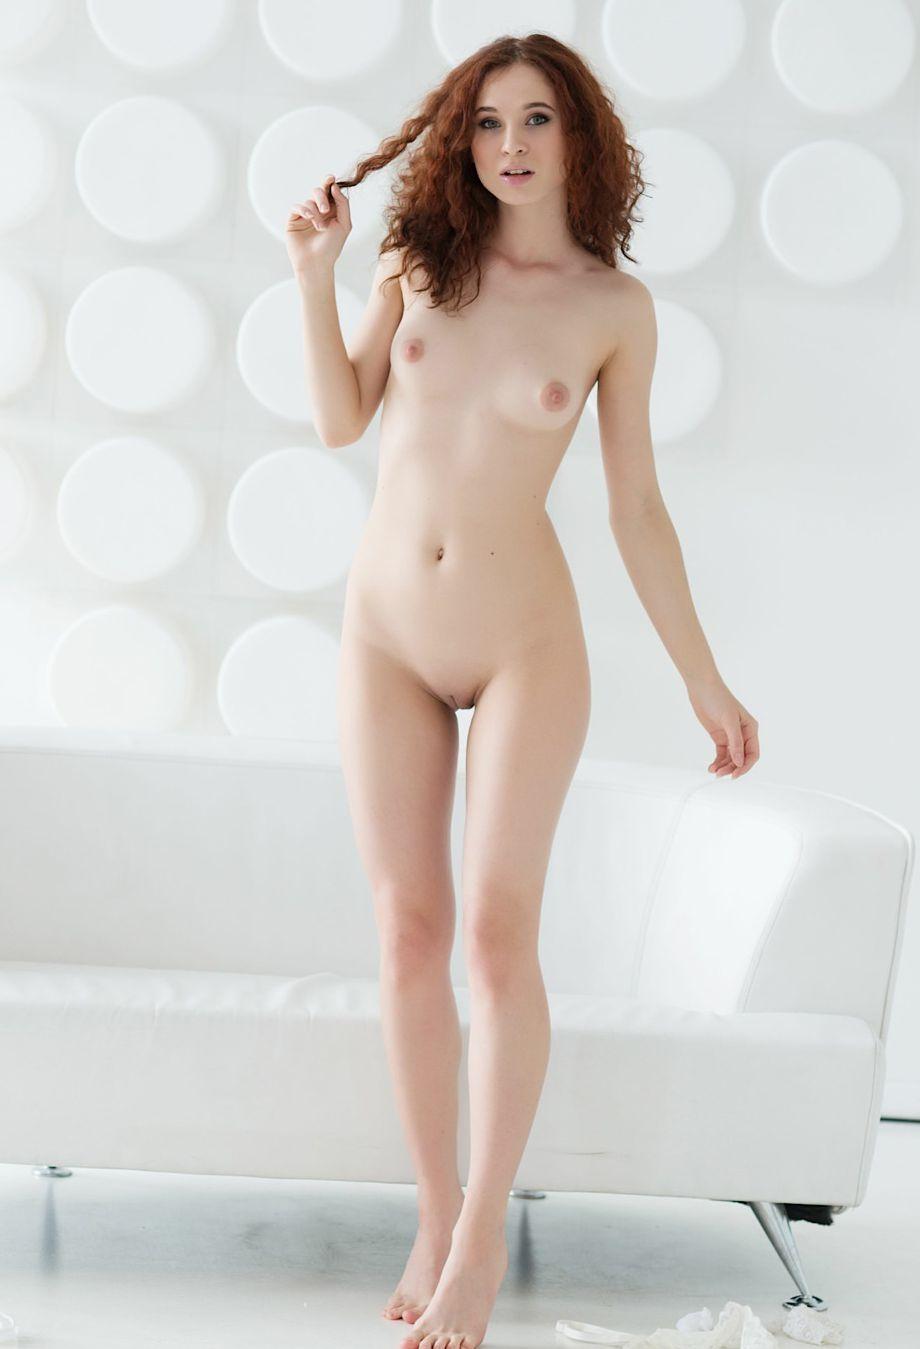 nudes-ruivas-gostosas-peladas-04